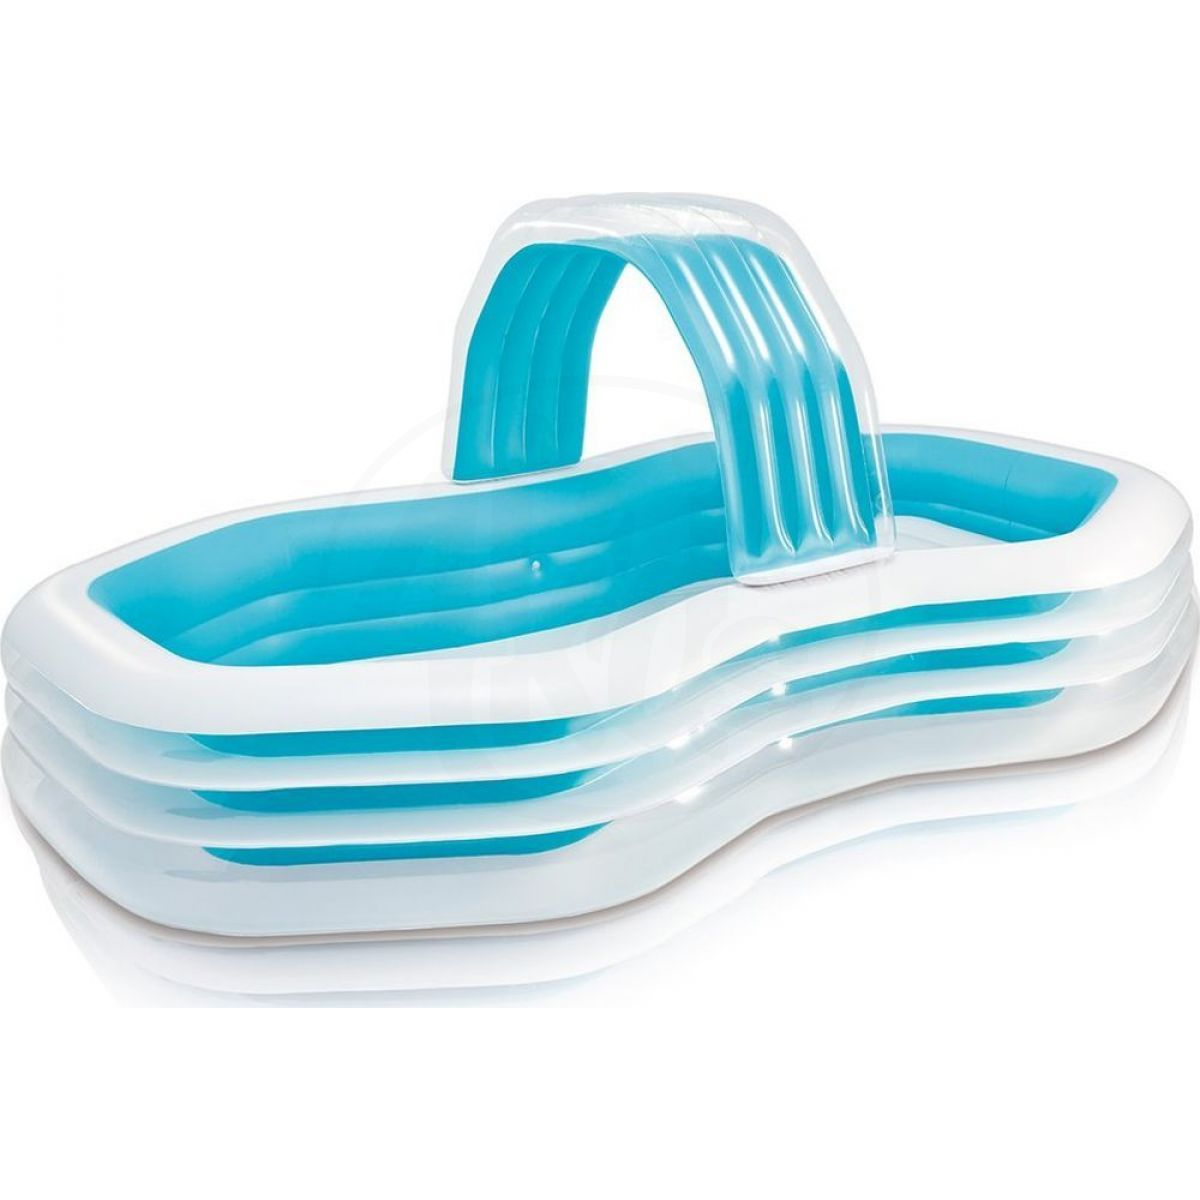 Intex 57198 Family Cabana Pool bazén 310 x 188 x 130 cm